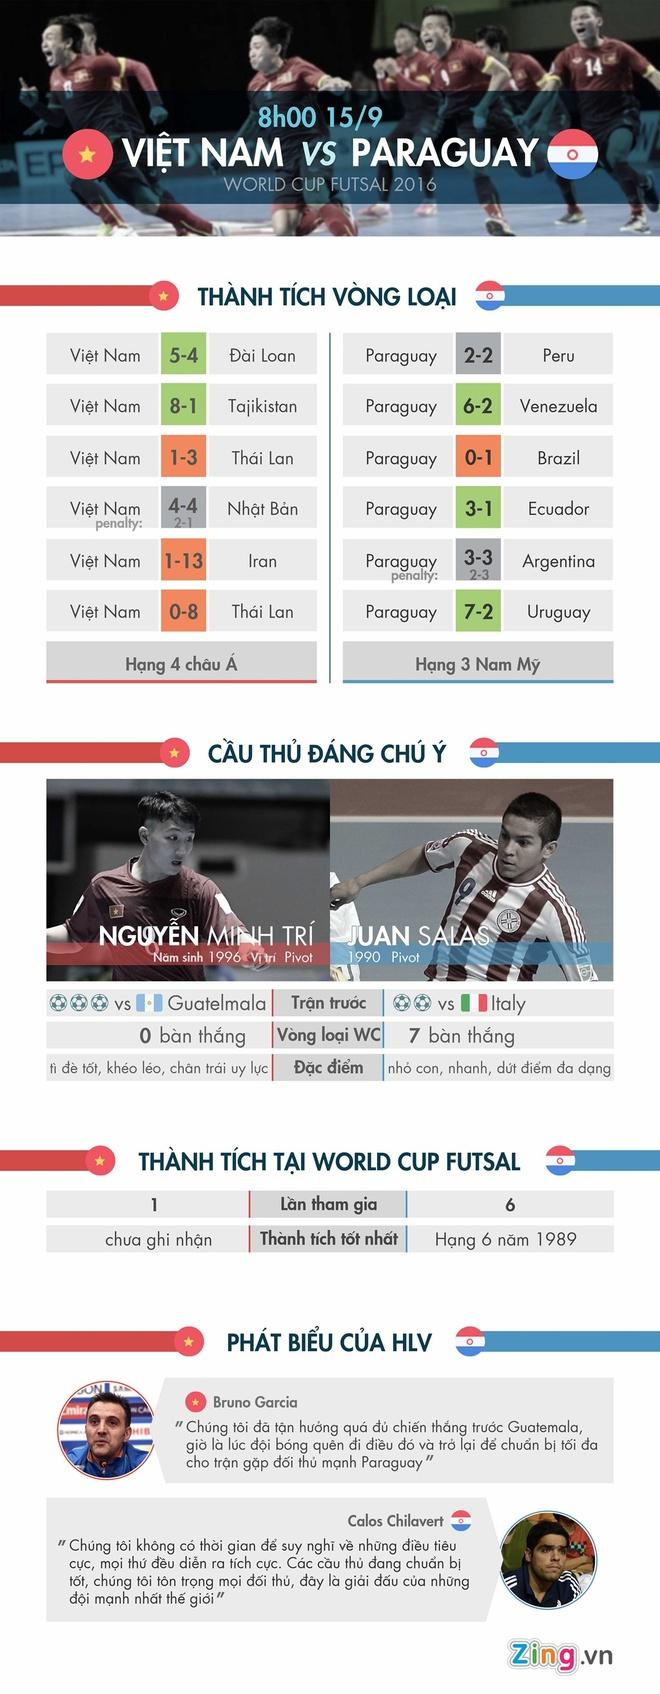 Futsal VN 1-7 Paraguay: Van Vu ghi ban dep mat cuoi tran hinh anh 3